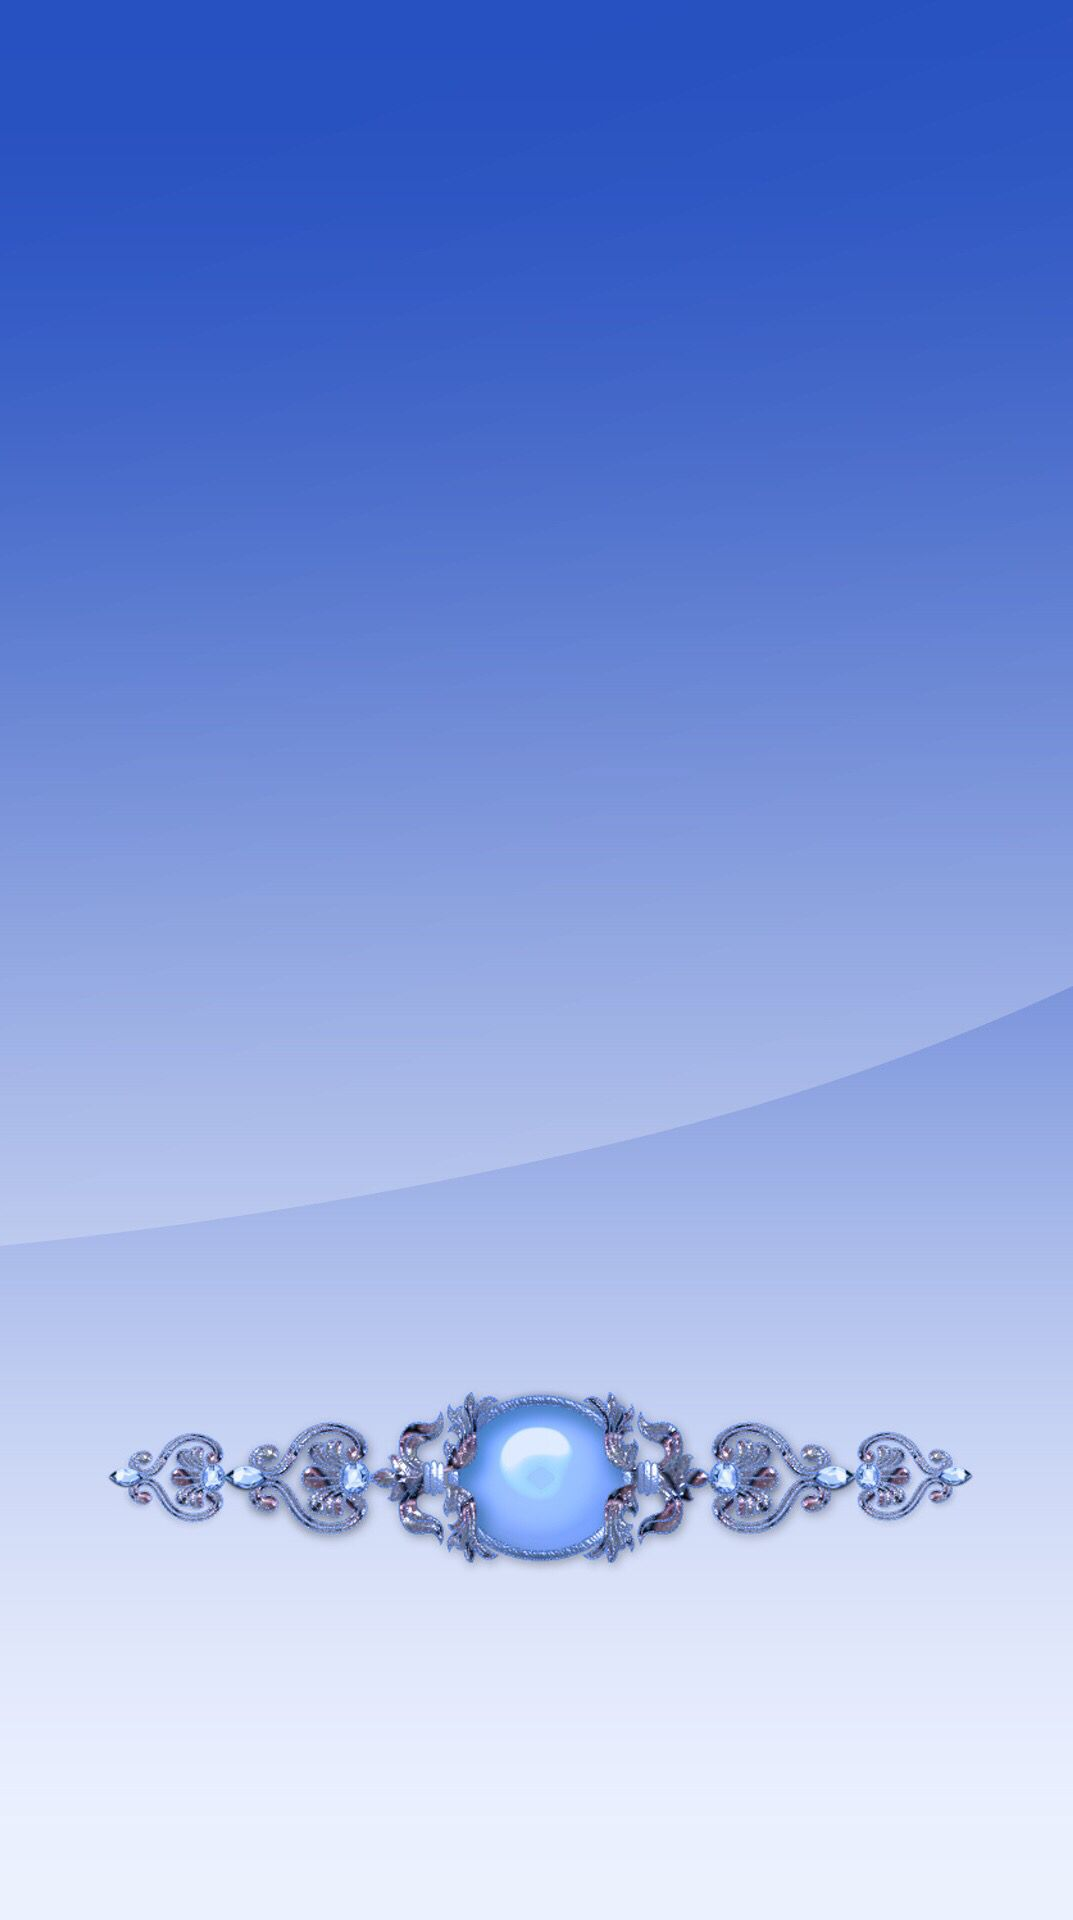 Magic background magic background backgrounds phone